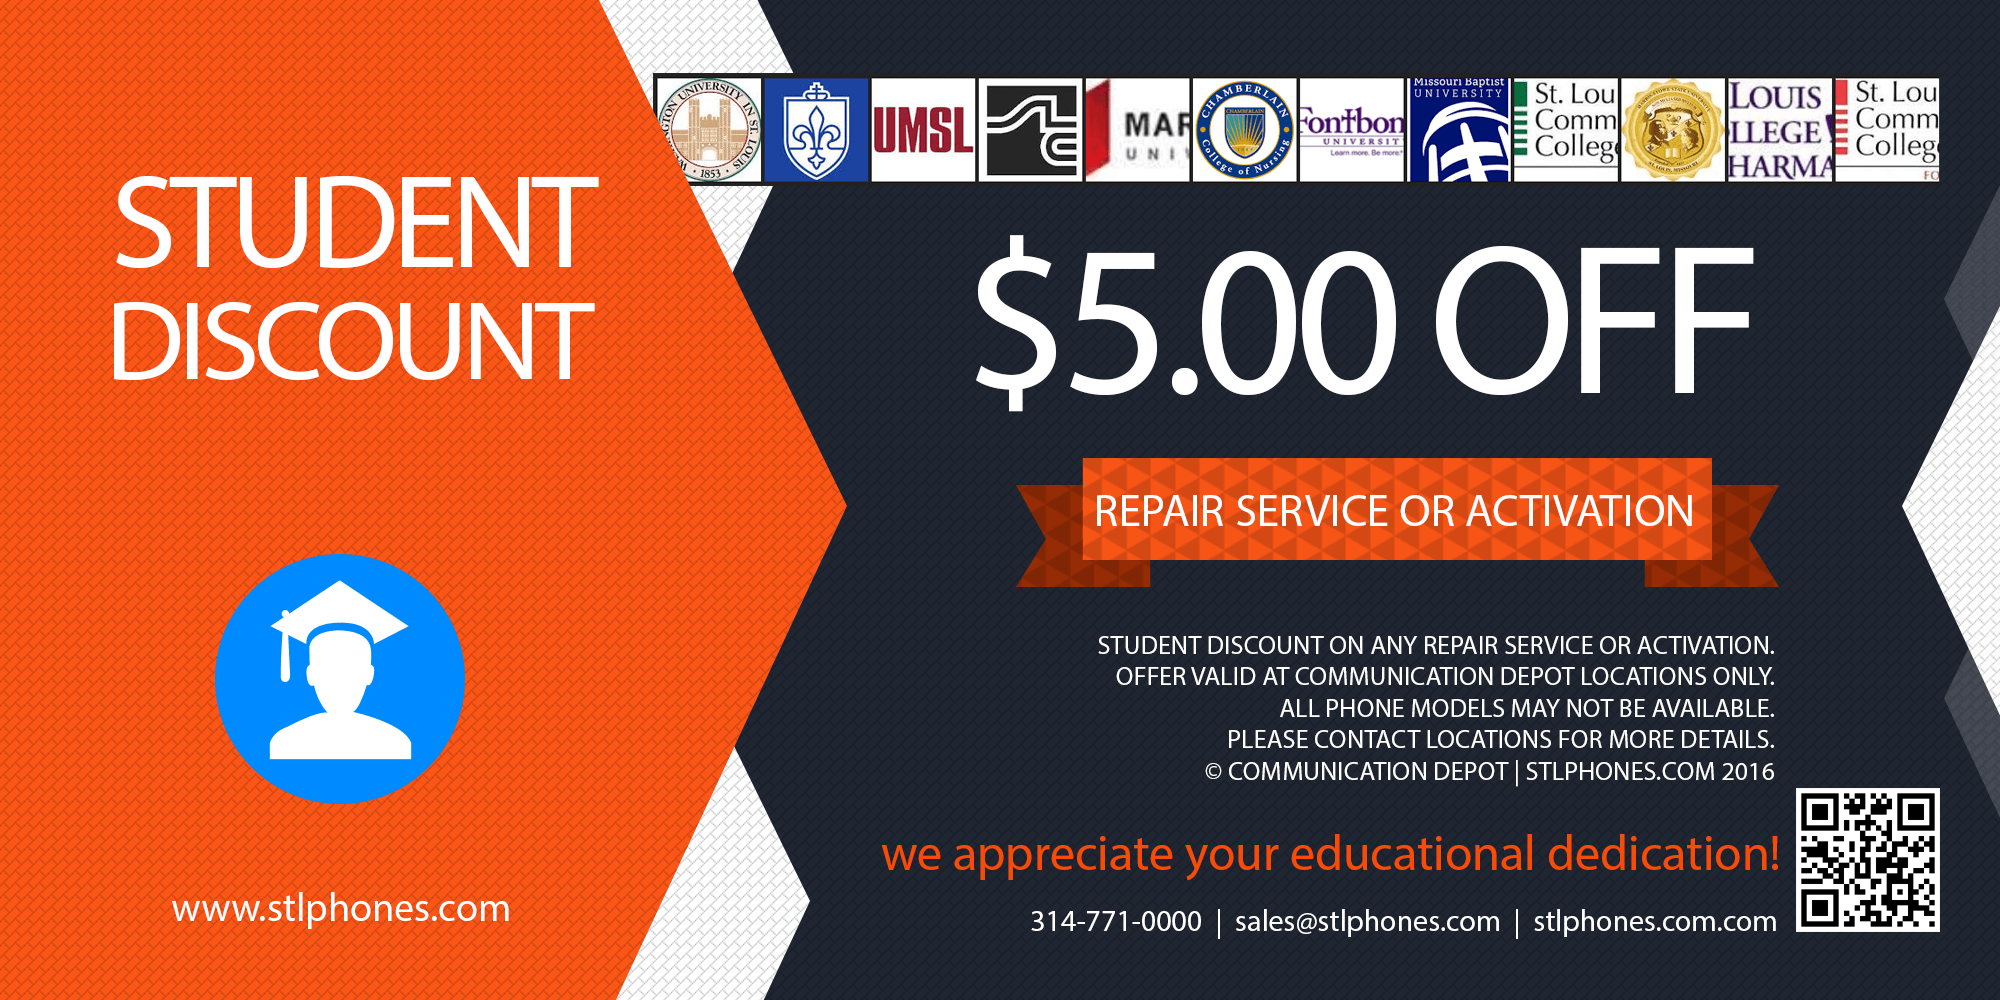 2016-COMMUNICATION-DEPOT-student-discount-coupon_9d7ca258-fe2f-452c-9e92-89f3647737a6.png